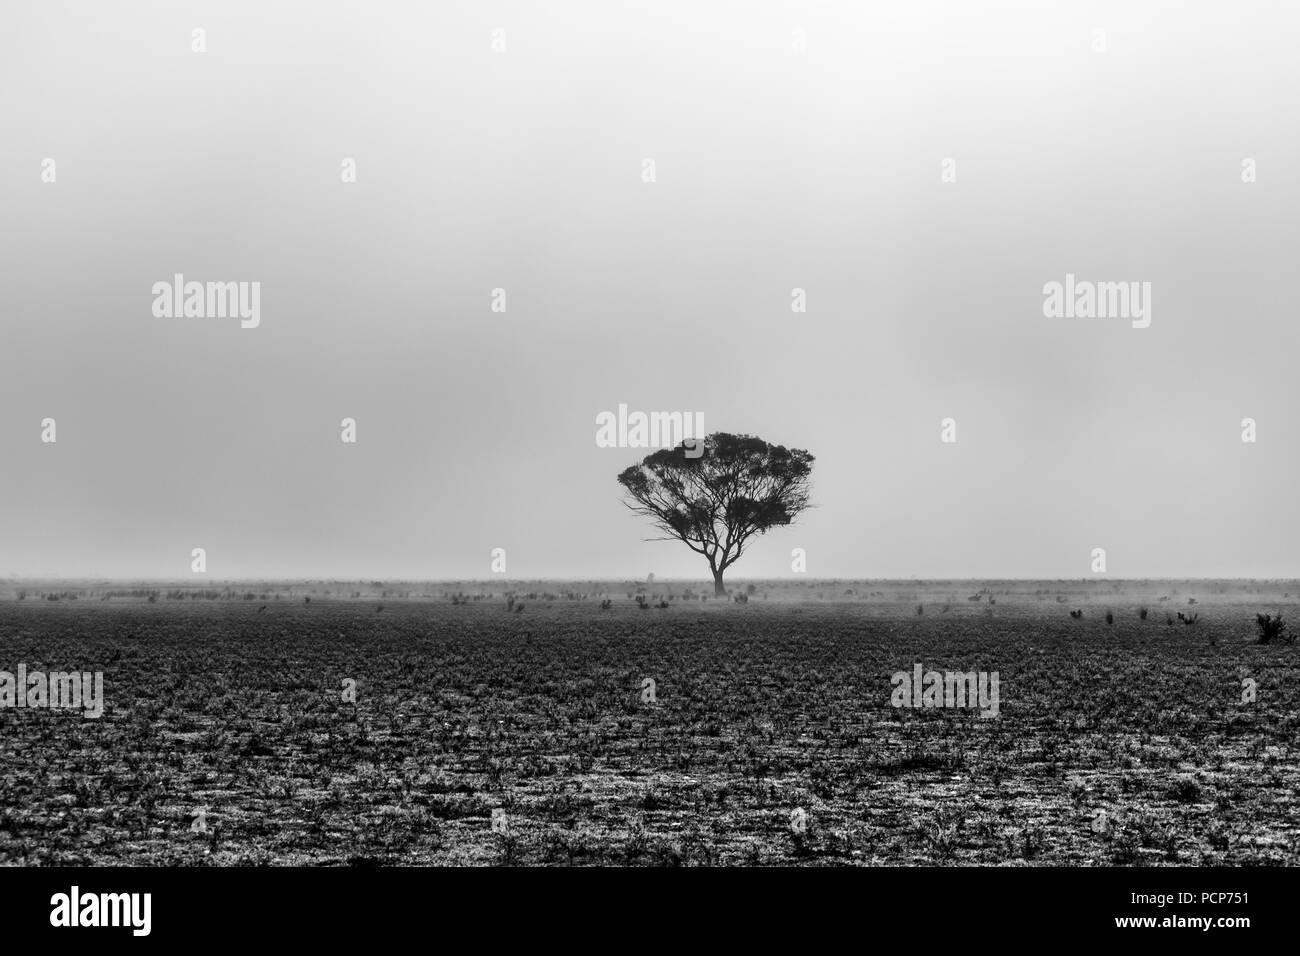 Lonely tree in the morning mist in South Australian desert - Stock Image